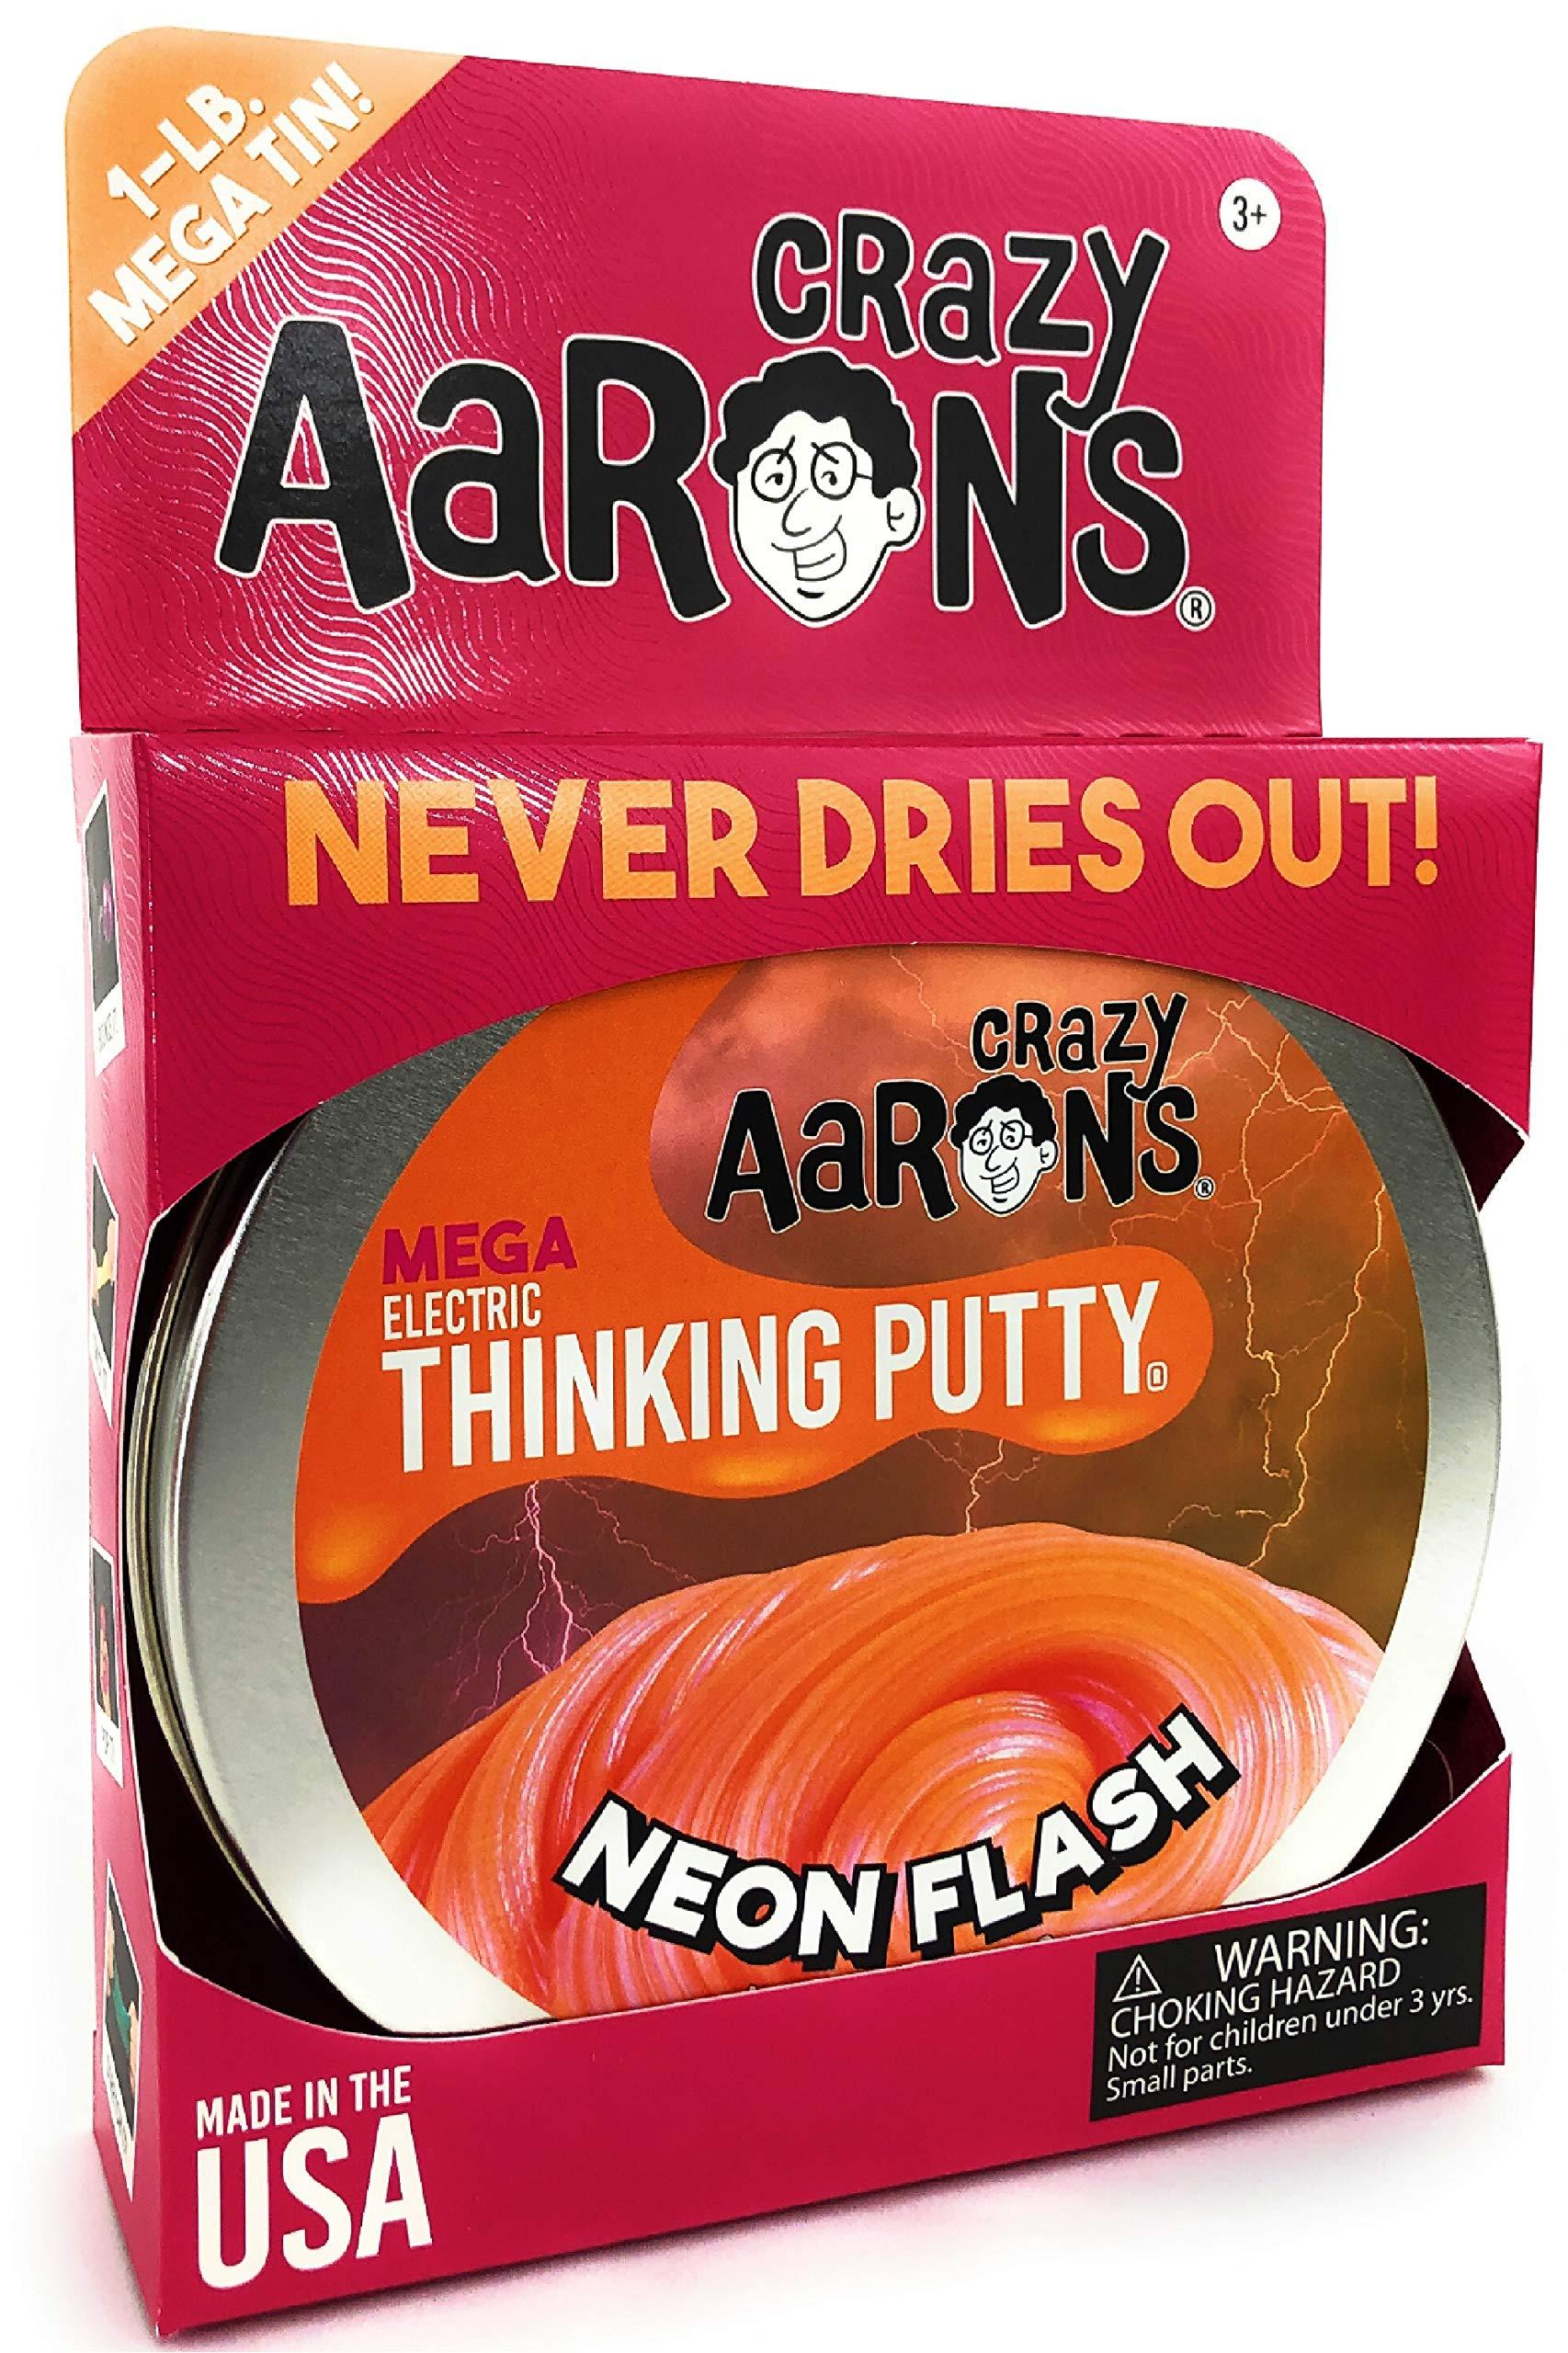 Crazy Aaron's Electric Thinking Putty MEGA Tin Neon Flash - 1 Pound (.16oz) by Crazy Aaron's (Image #3)